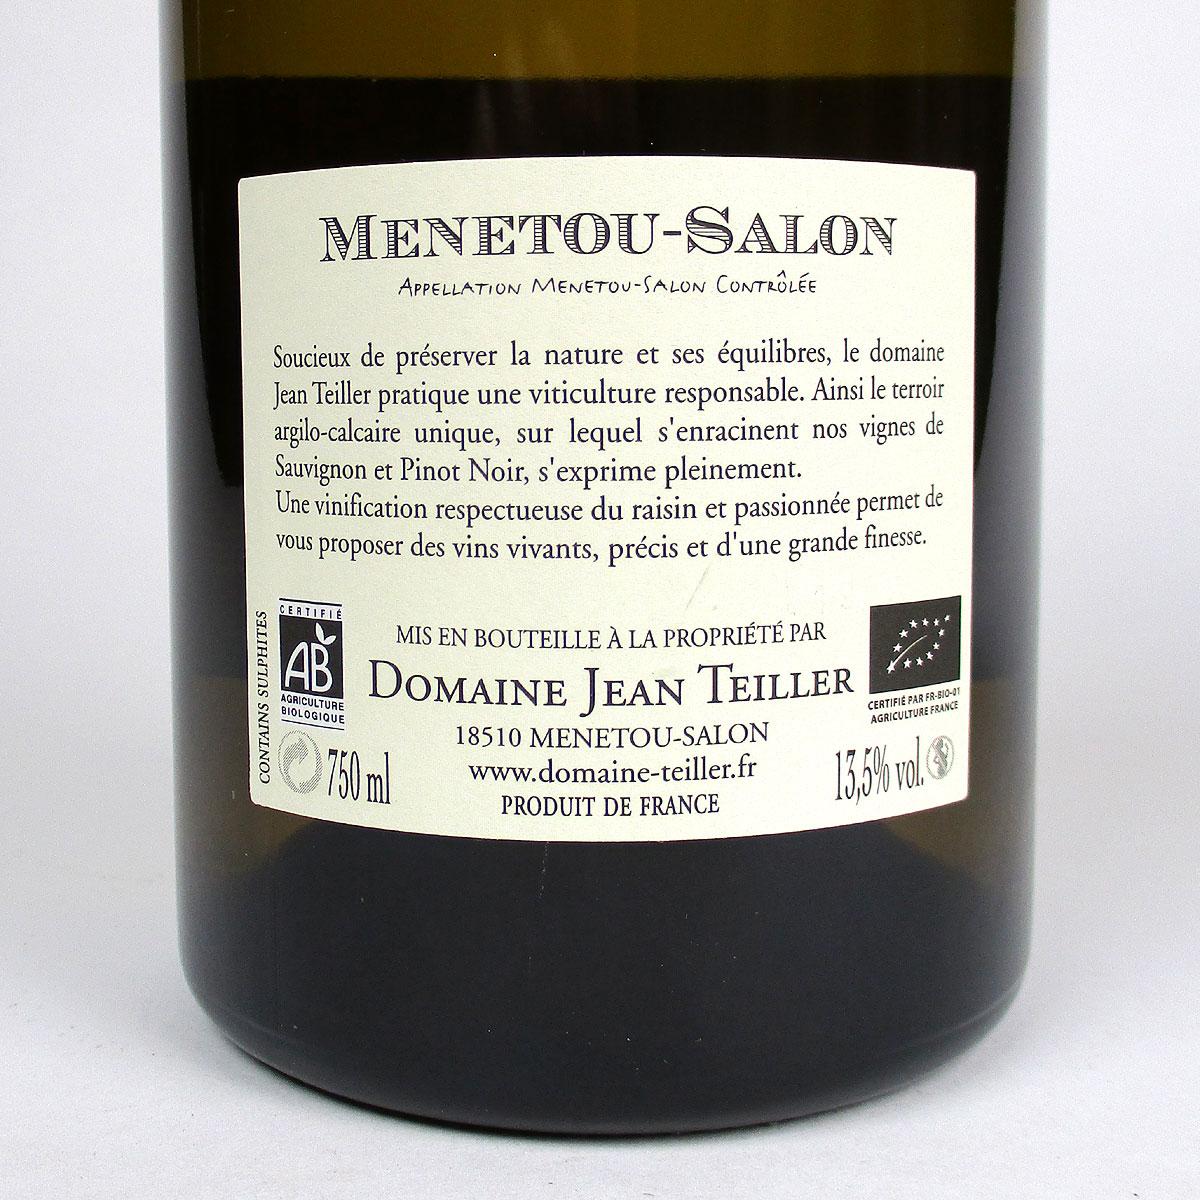 Menetou Salon: Domaine Jean Teiller Blanc 2019 - Bottle Rear Label